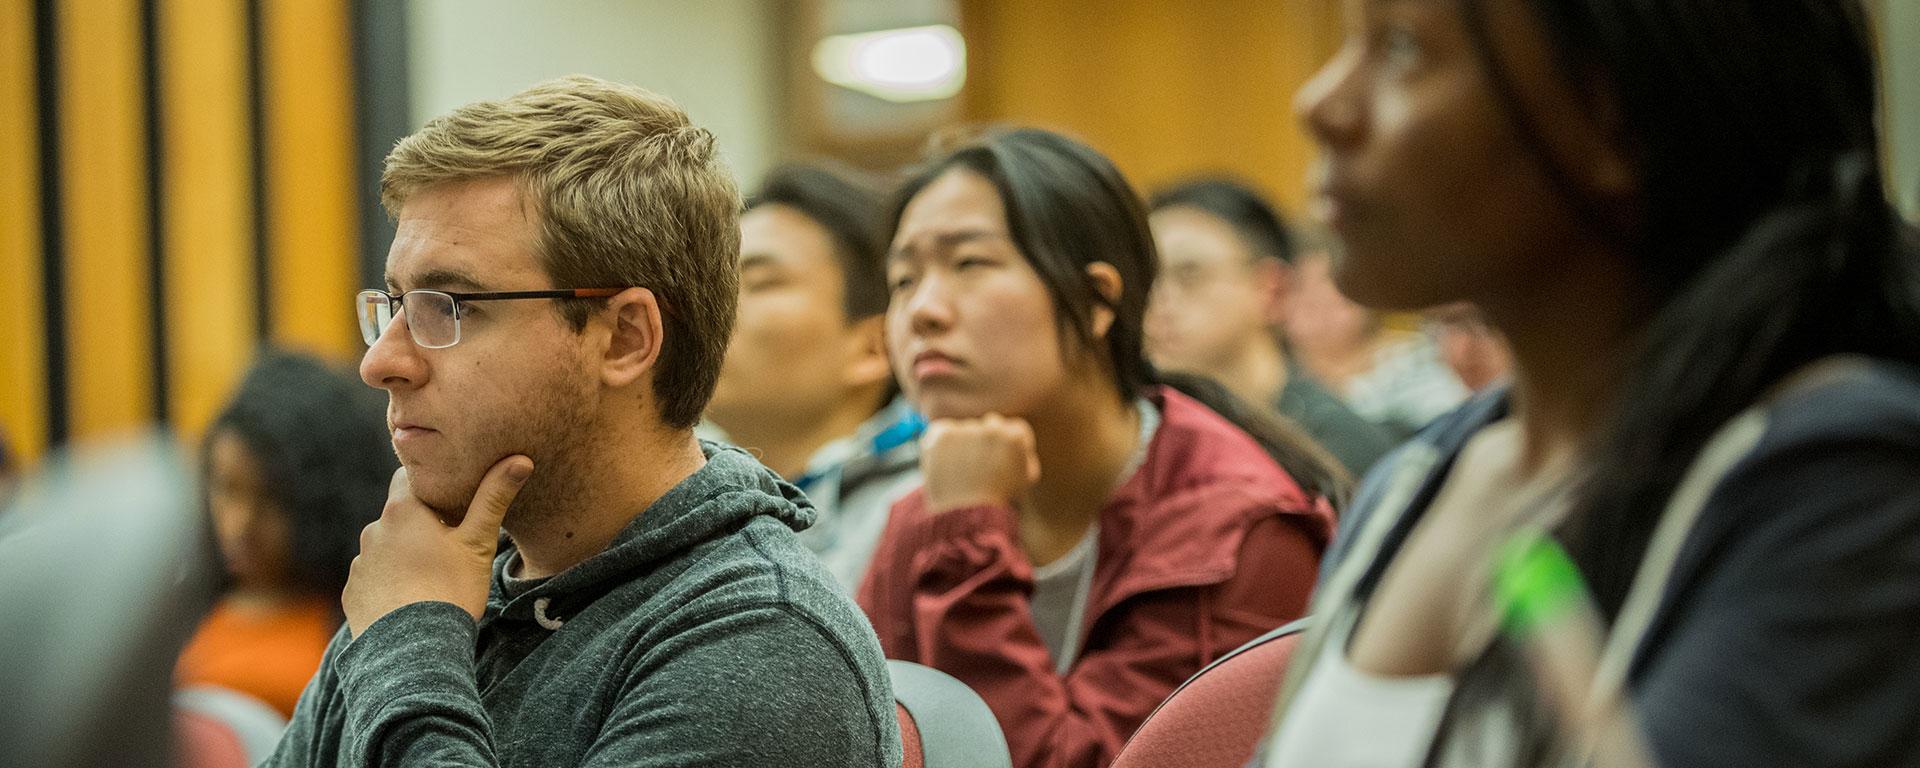 Human sexuality studies graduate programs